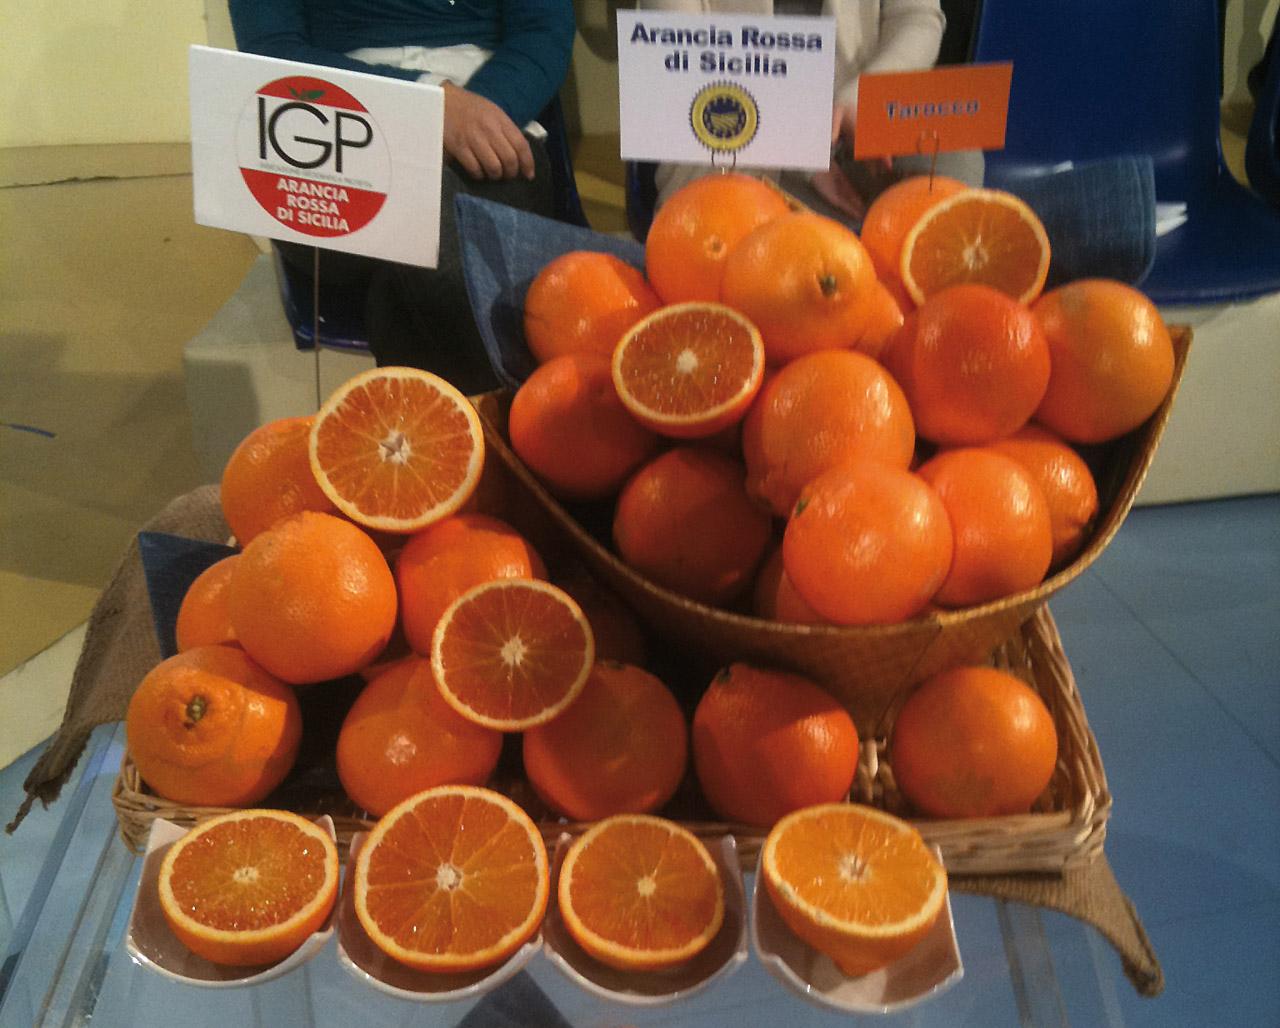 Arancia Rossa di Sicilia IGP foto-18